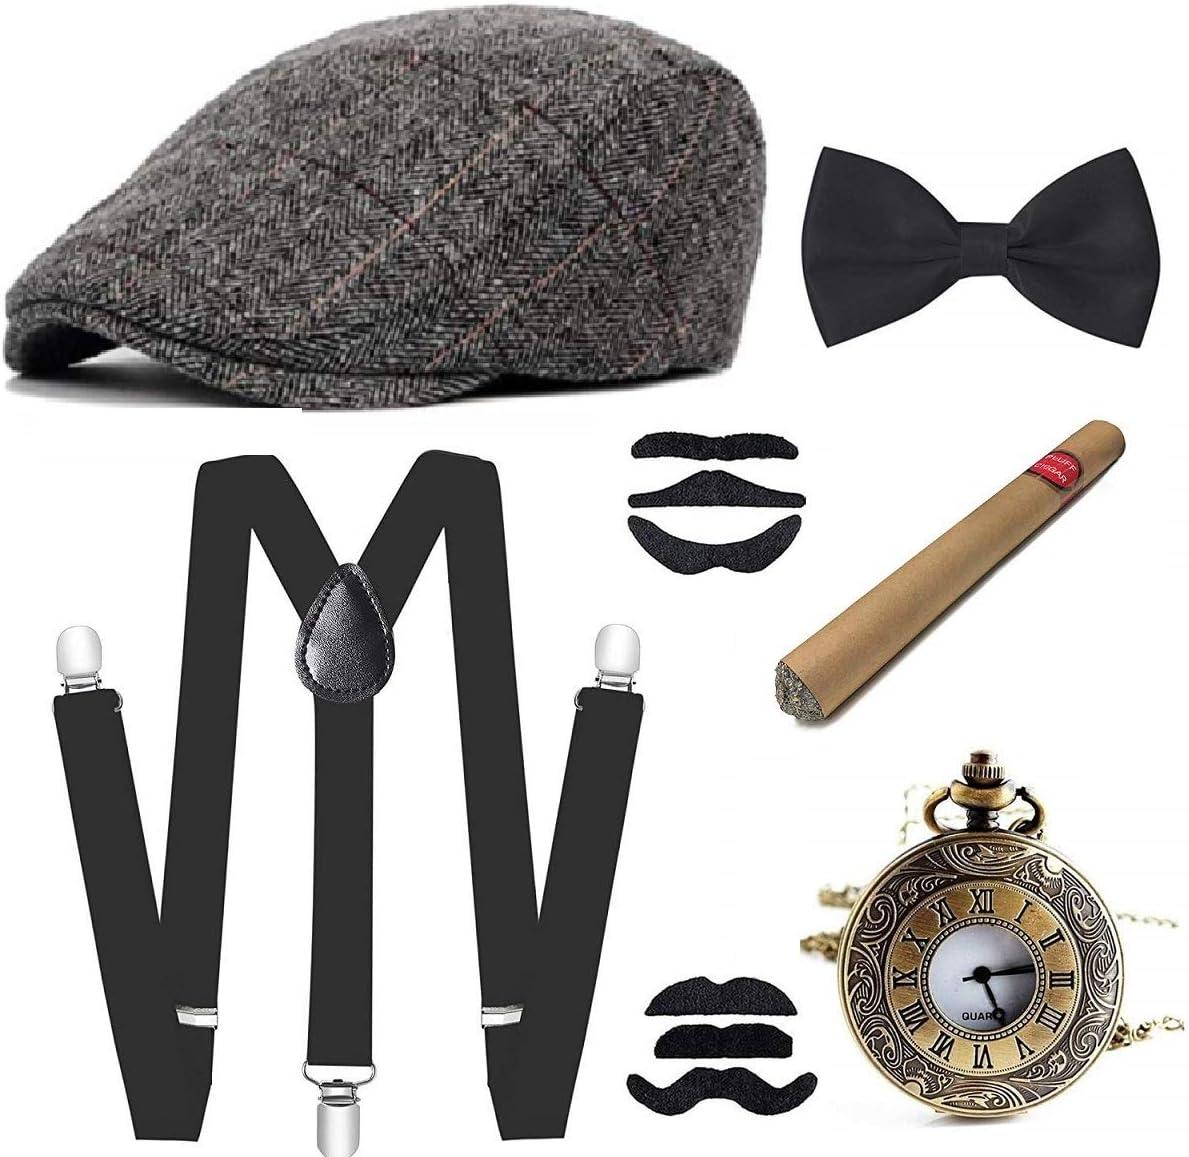 E EBETA 1920s Disfraces Accesorios Gatsby Accesorios para Hombre Cigar, Sombrero, Elástico Tirante, Pajarita y Reloj de Bolsilloo (C)